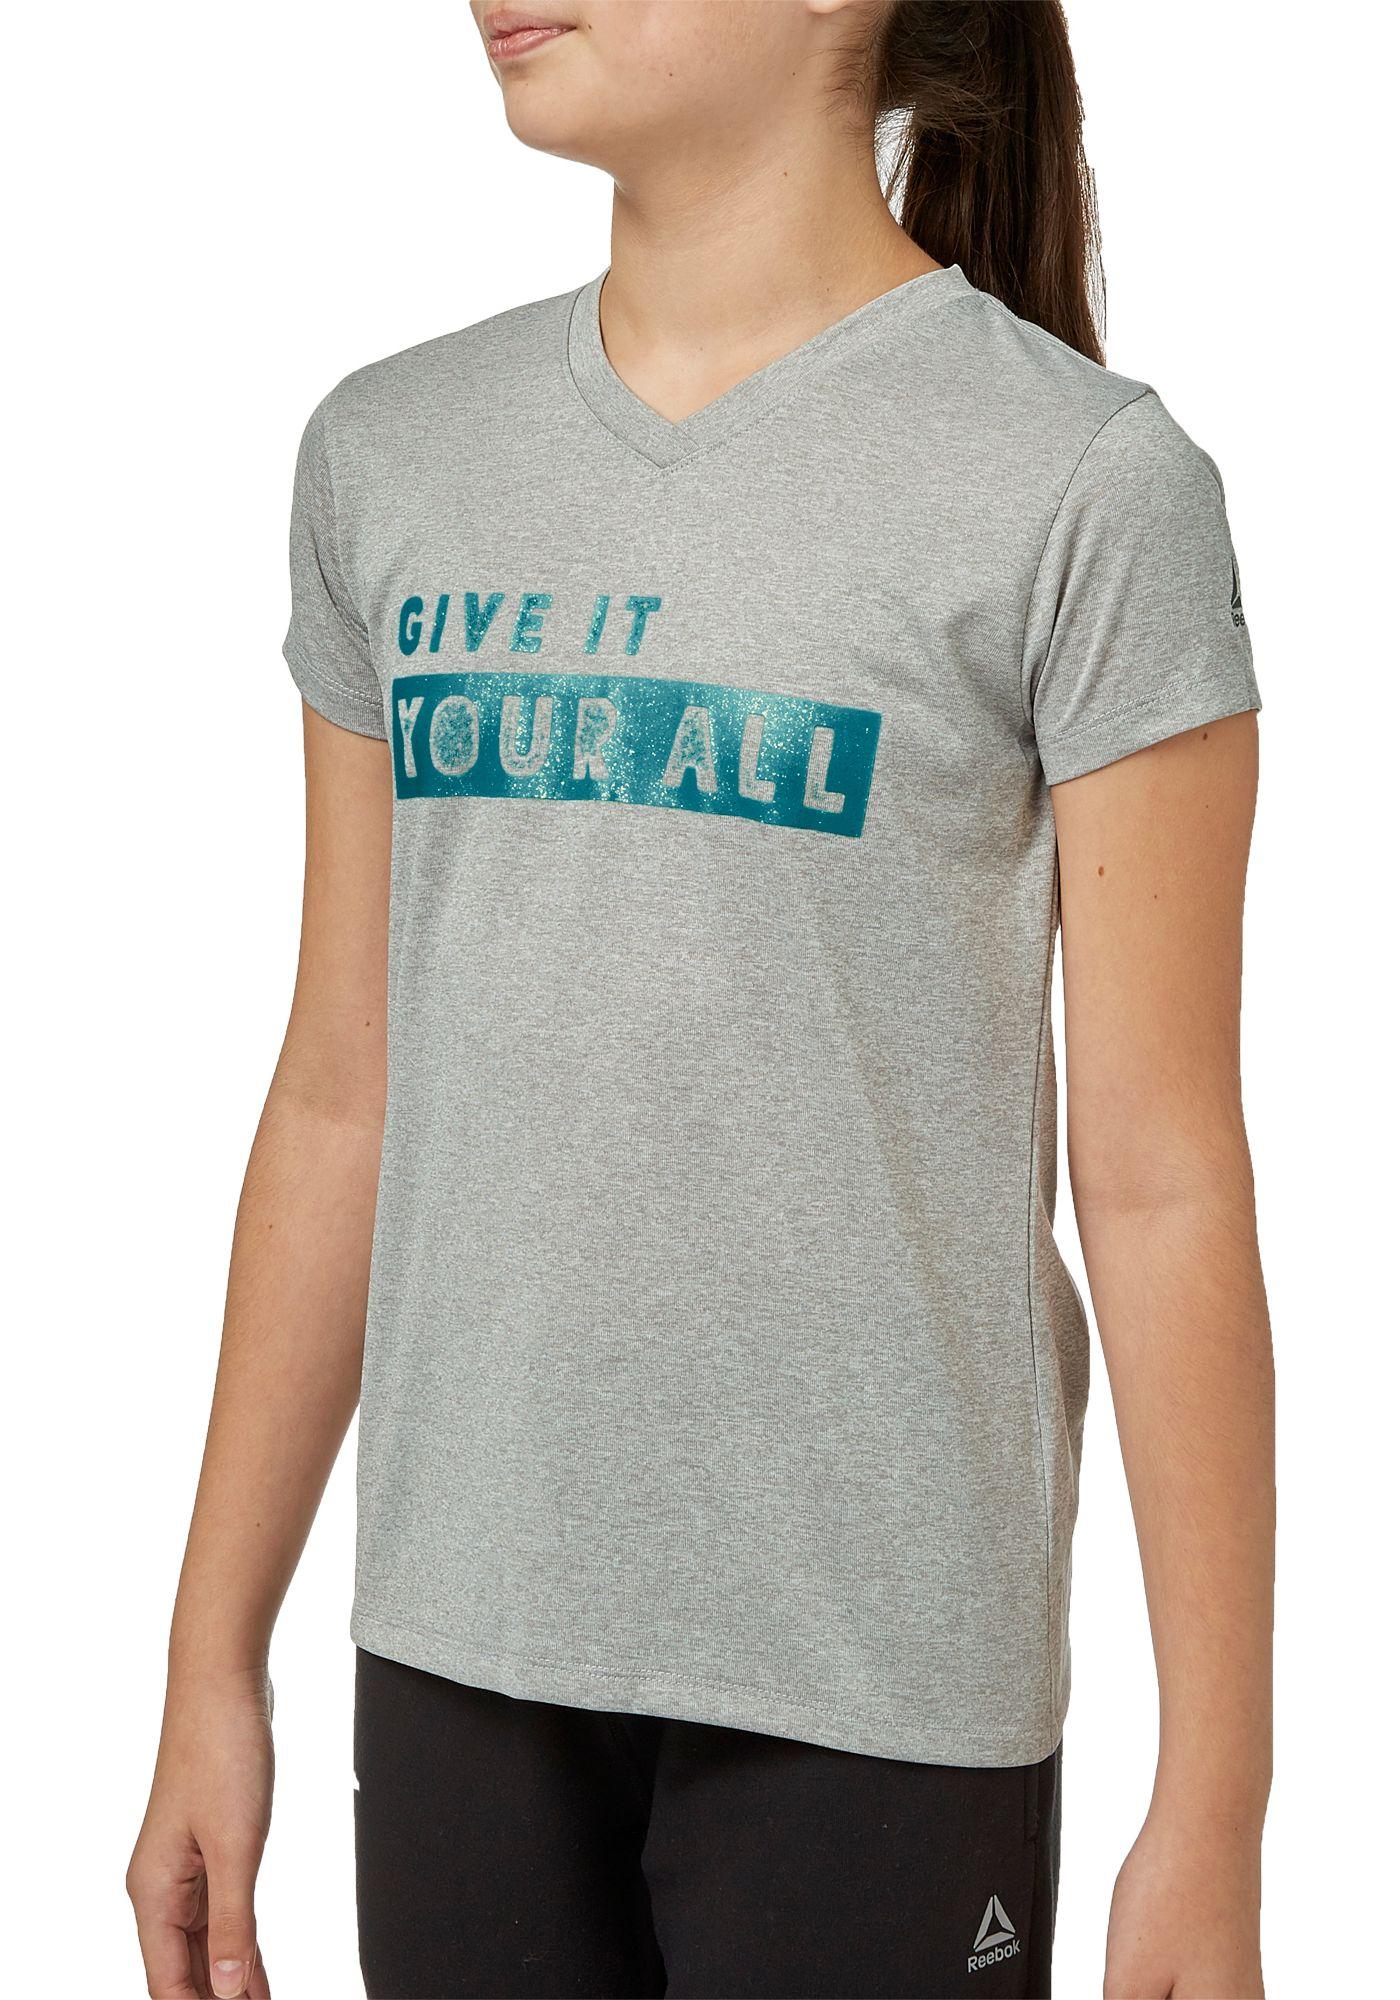 Reebok Girls' Heather Graphic V-Neck T-Shirt